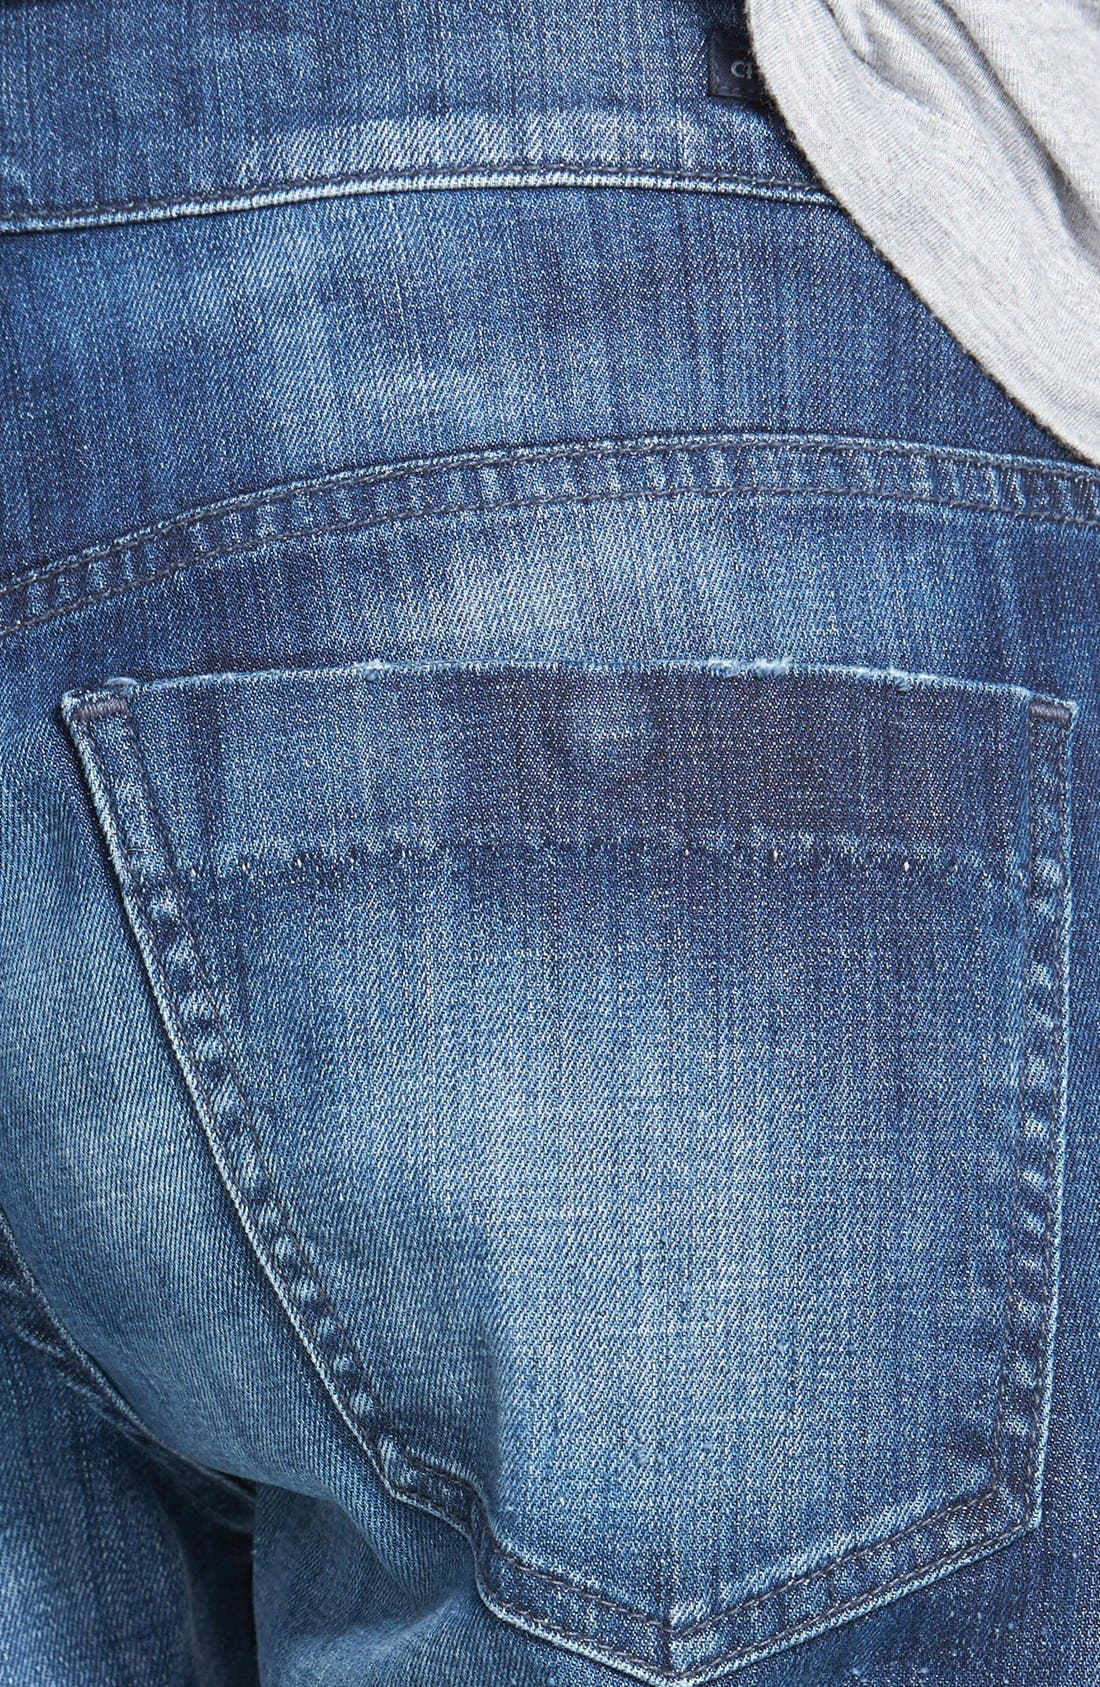 'Skyler' Crop Boyfriend Jeans,                             Alternate thumbnail 3, color,                             404